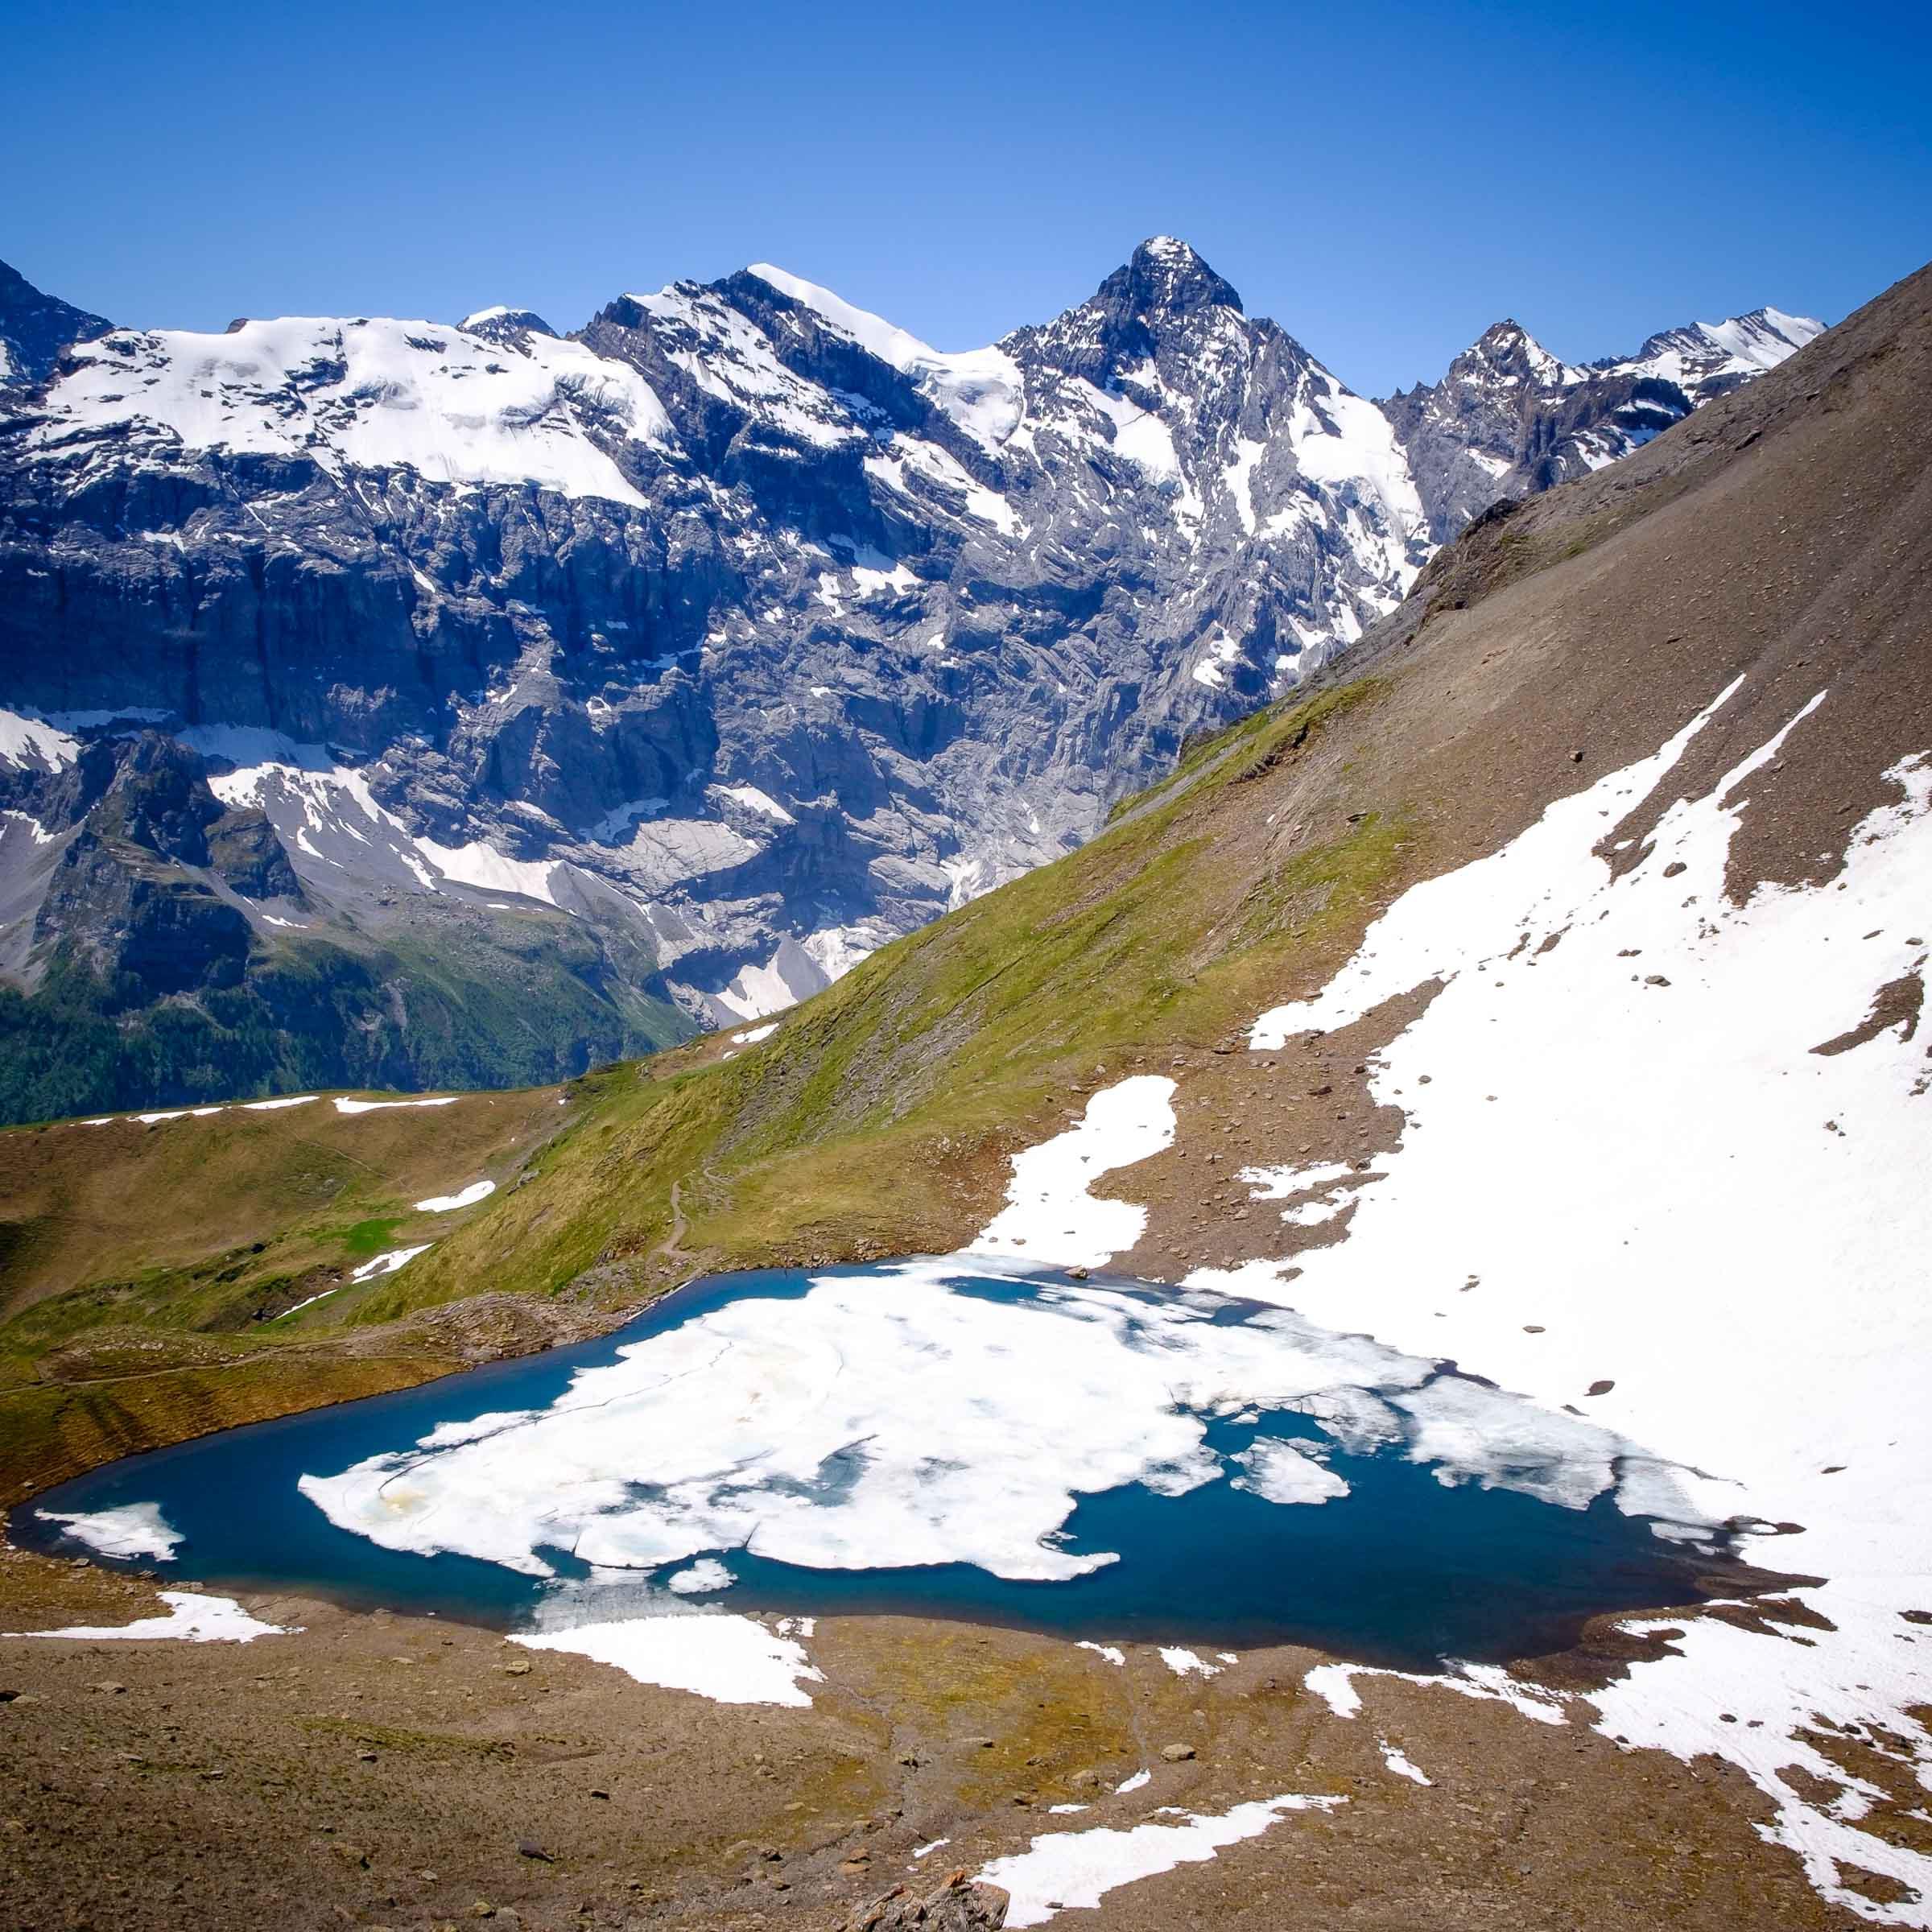 Grauseewli, Switzerland